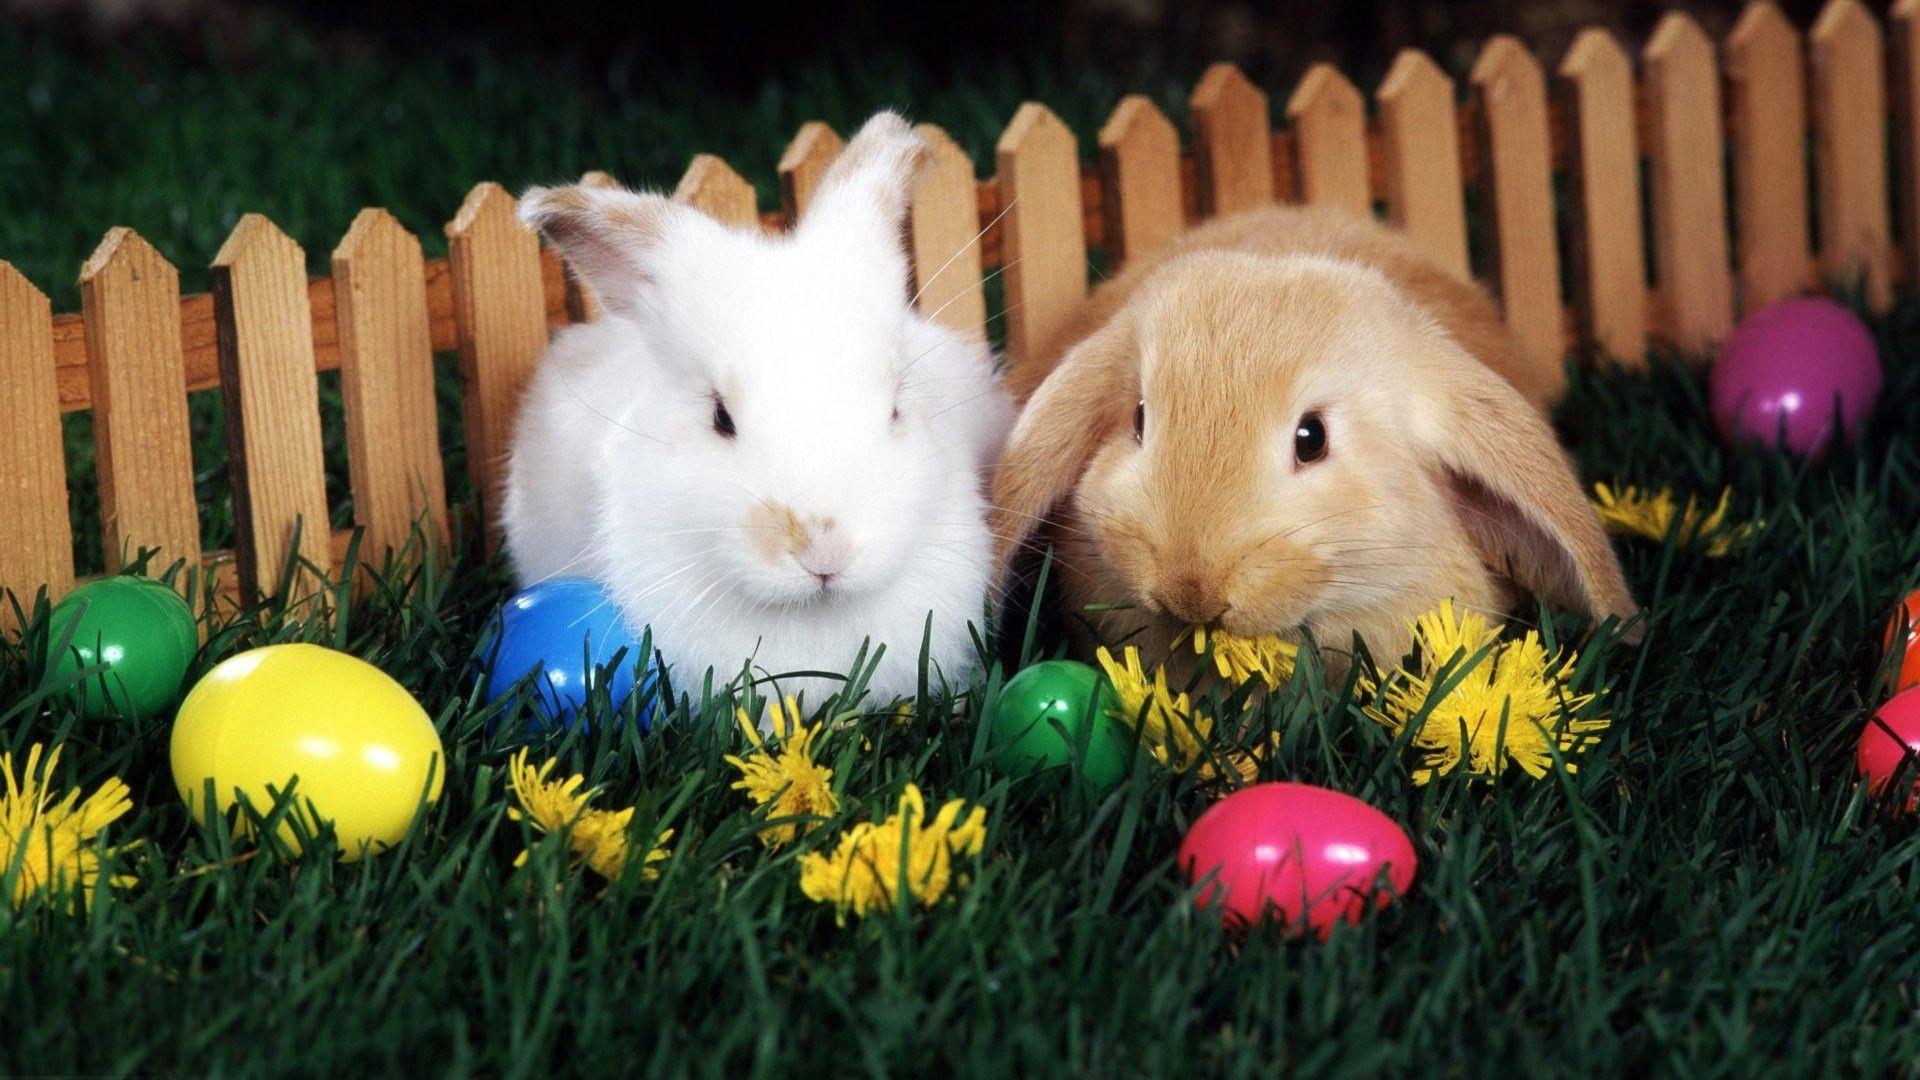 Bunny wallpaper photo full hd